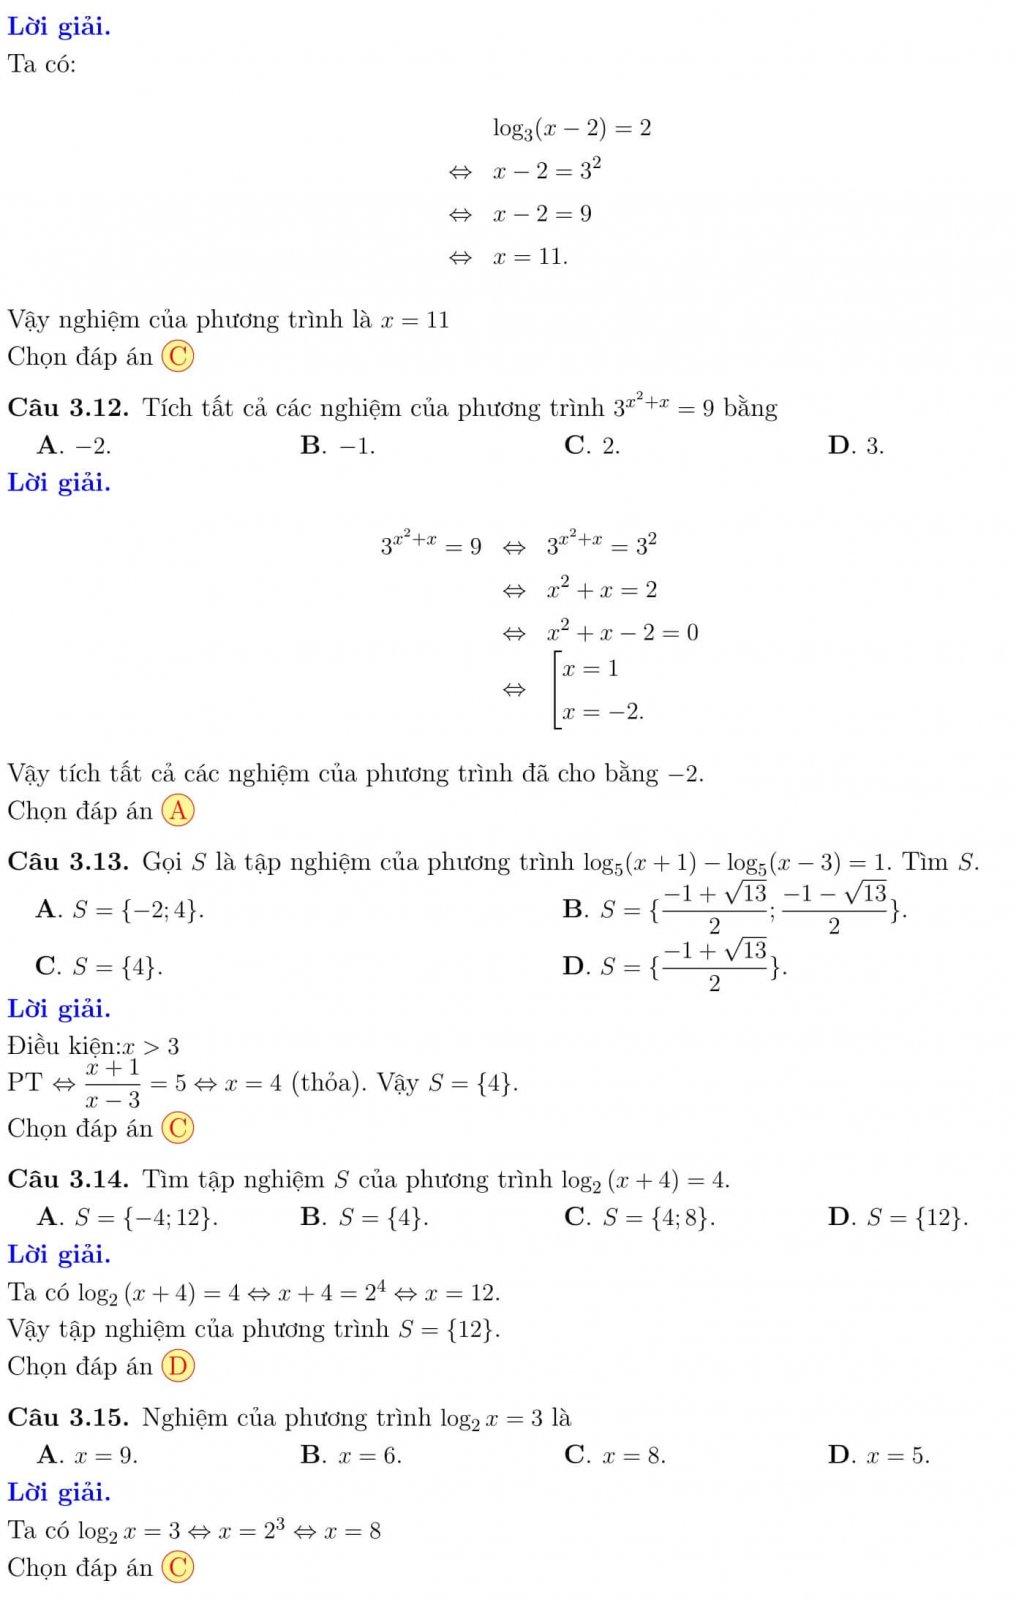 phat-trien-cau-3-phuong-trinh-mu-3-jpg.10499